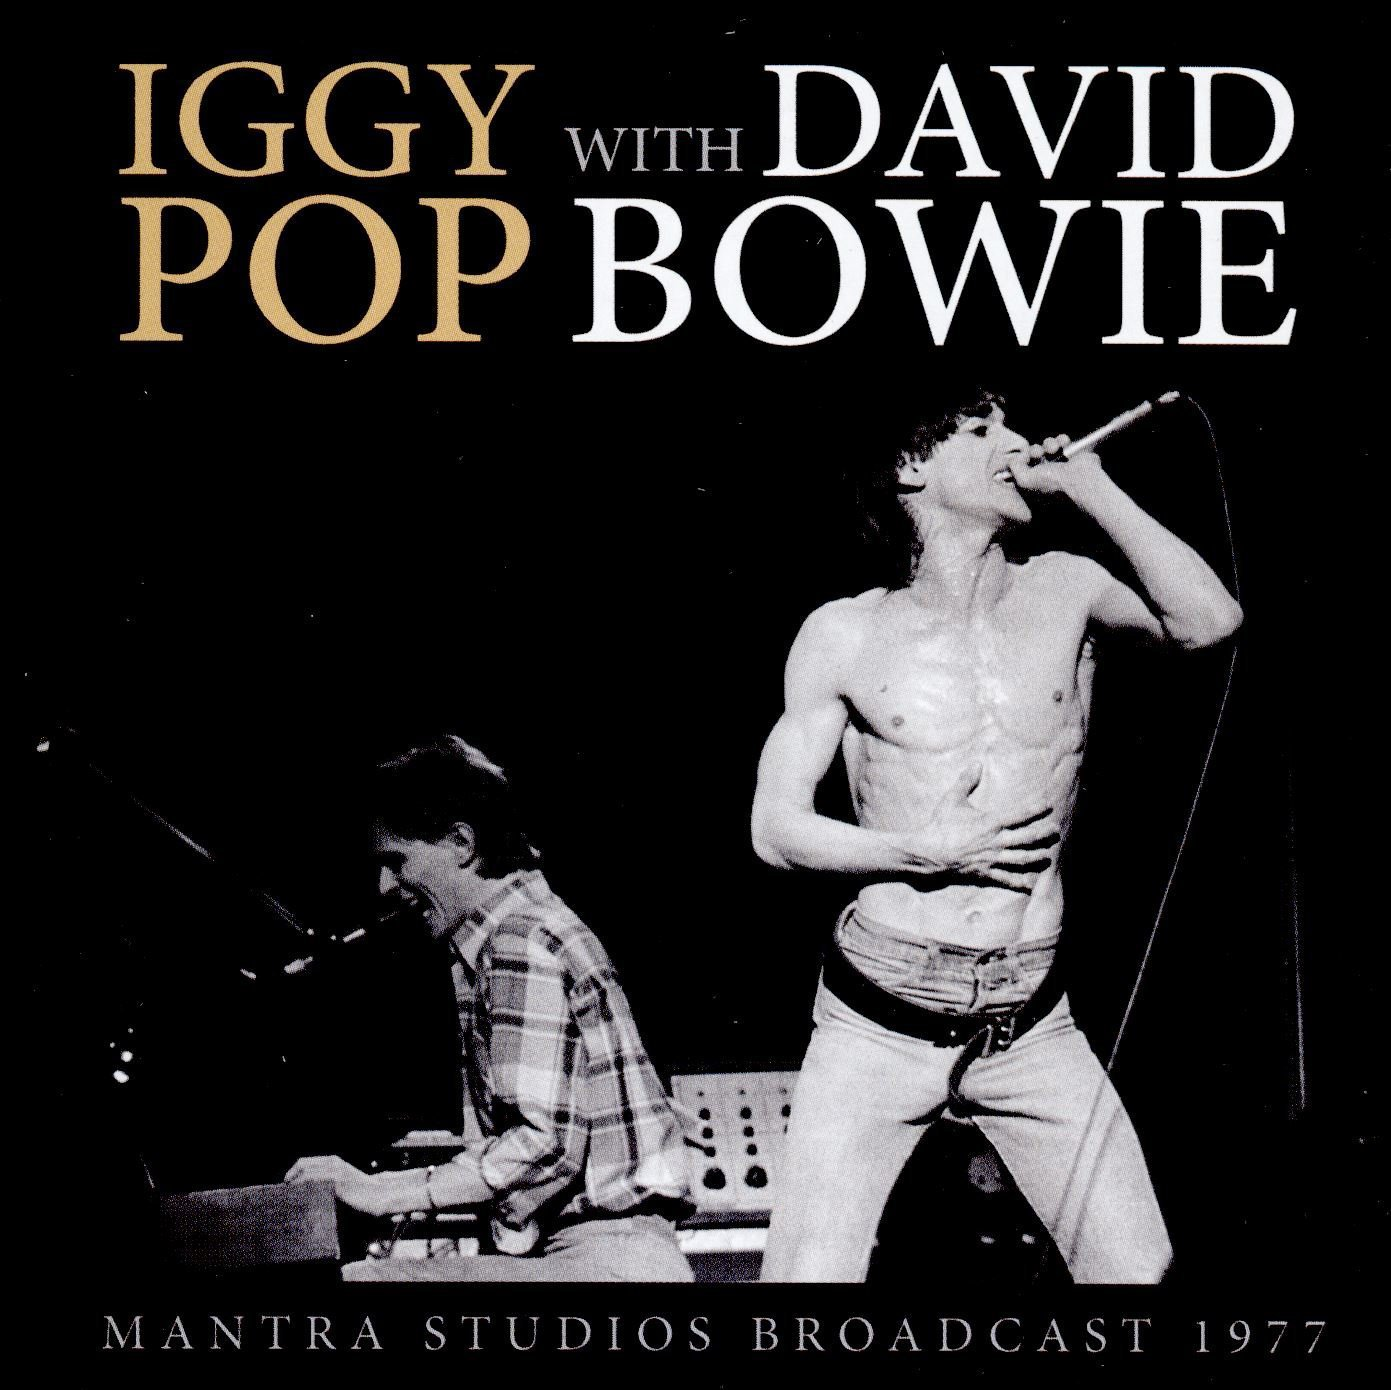 Mantra Studios Broadcast 1977